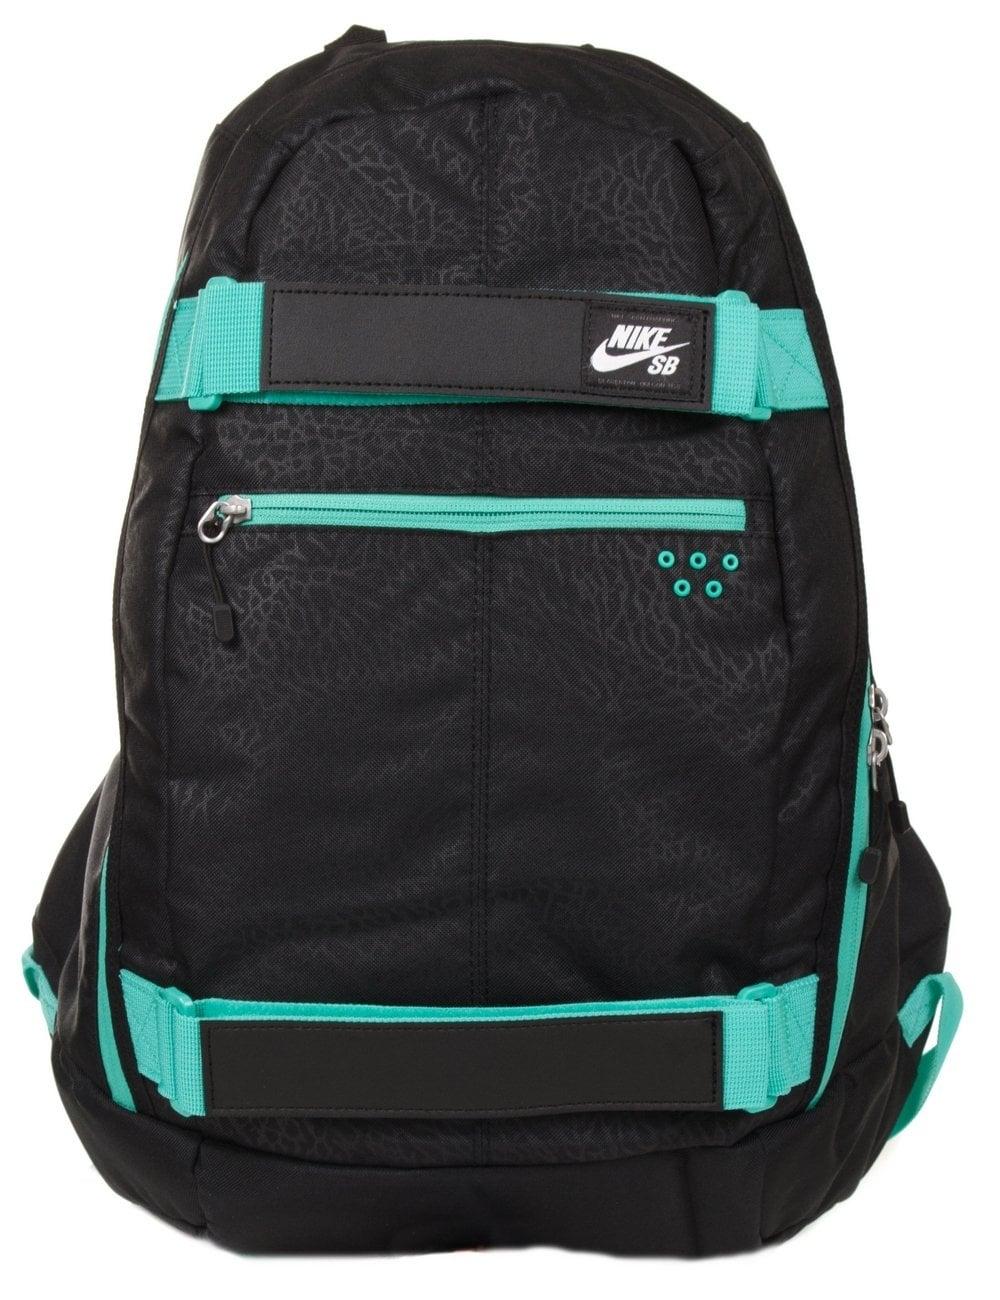 99bfcda147d3 Nike SB Embarca Backpack - Black Turq - Accessories from Fat Buddha ...